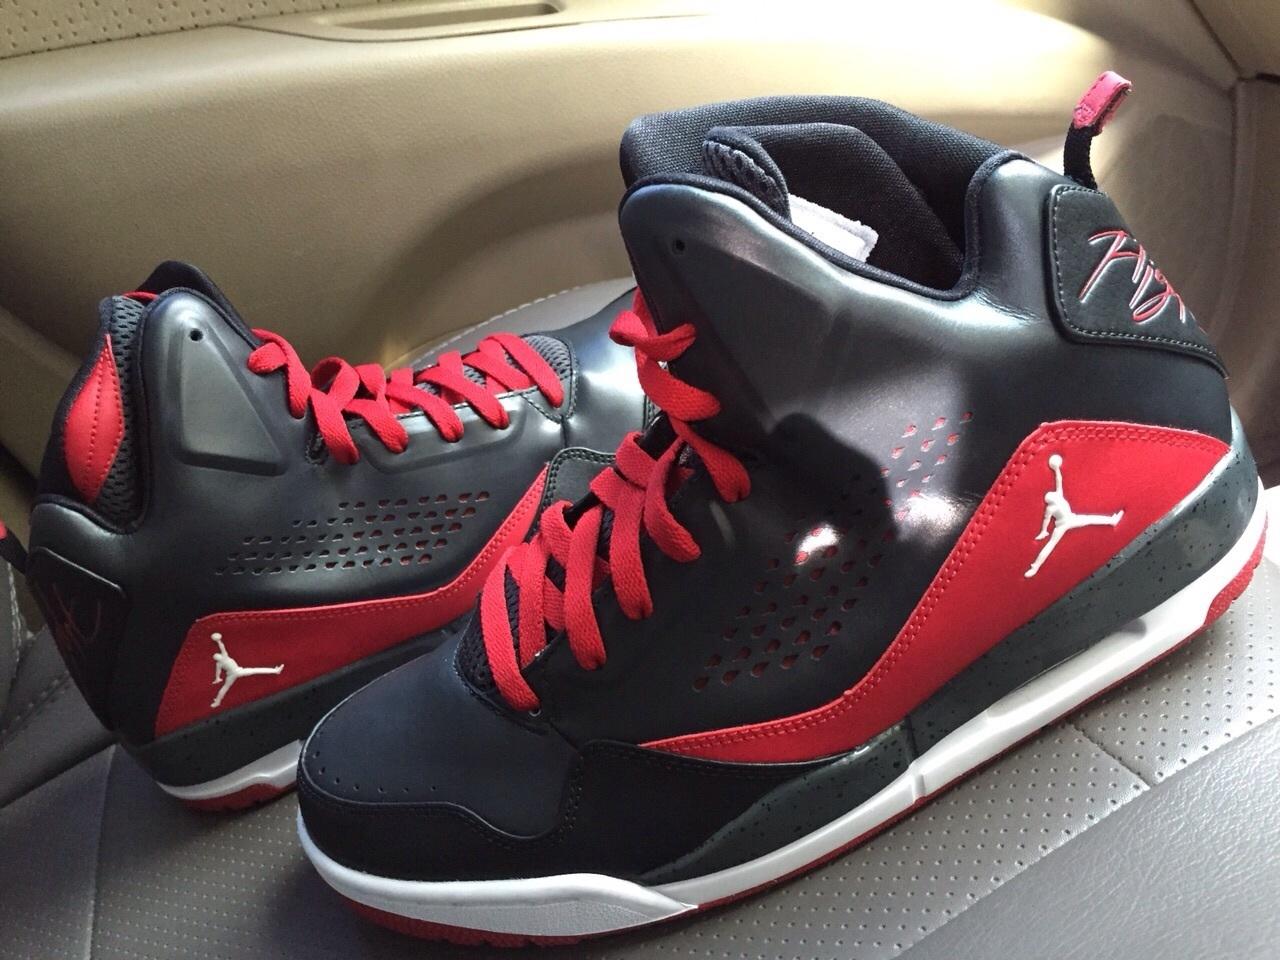 790ed1c697ce74 ... top quality jual air jordan sc3 sepatu original 100 tokopedia a0d5f  8c0fa